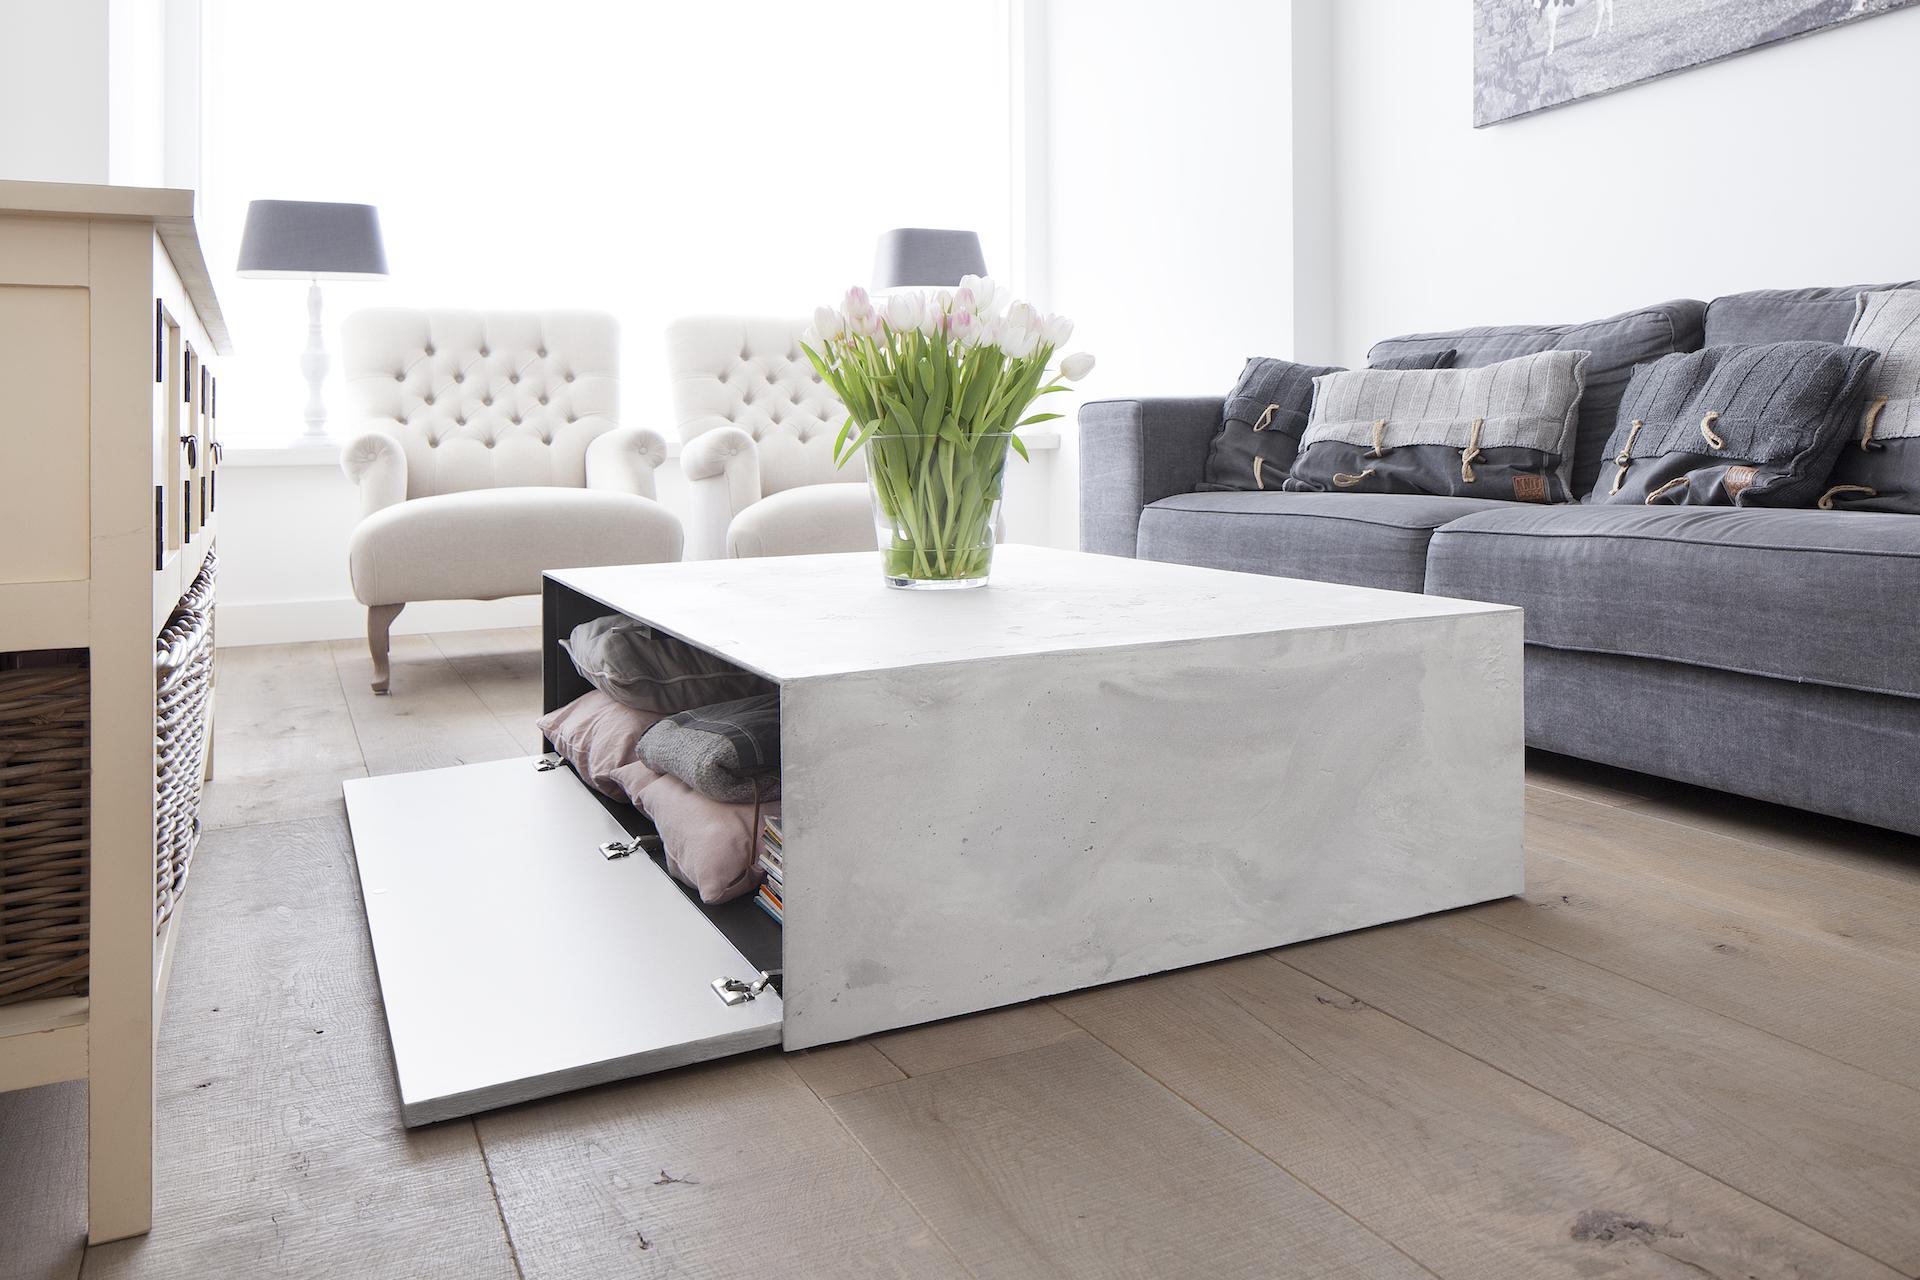 https://www.grezzo.nl/wp-content/uploads/2017/08/grezzo-salontafel-woonkamer-betonlook-5.jpg